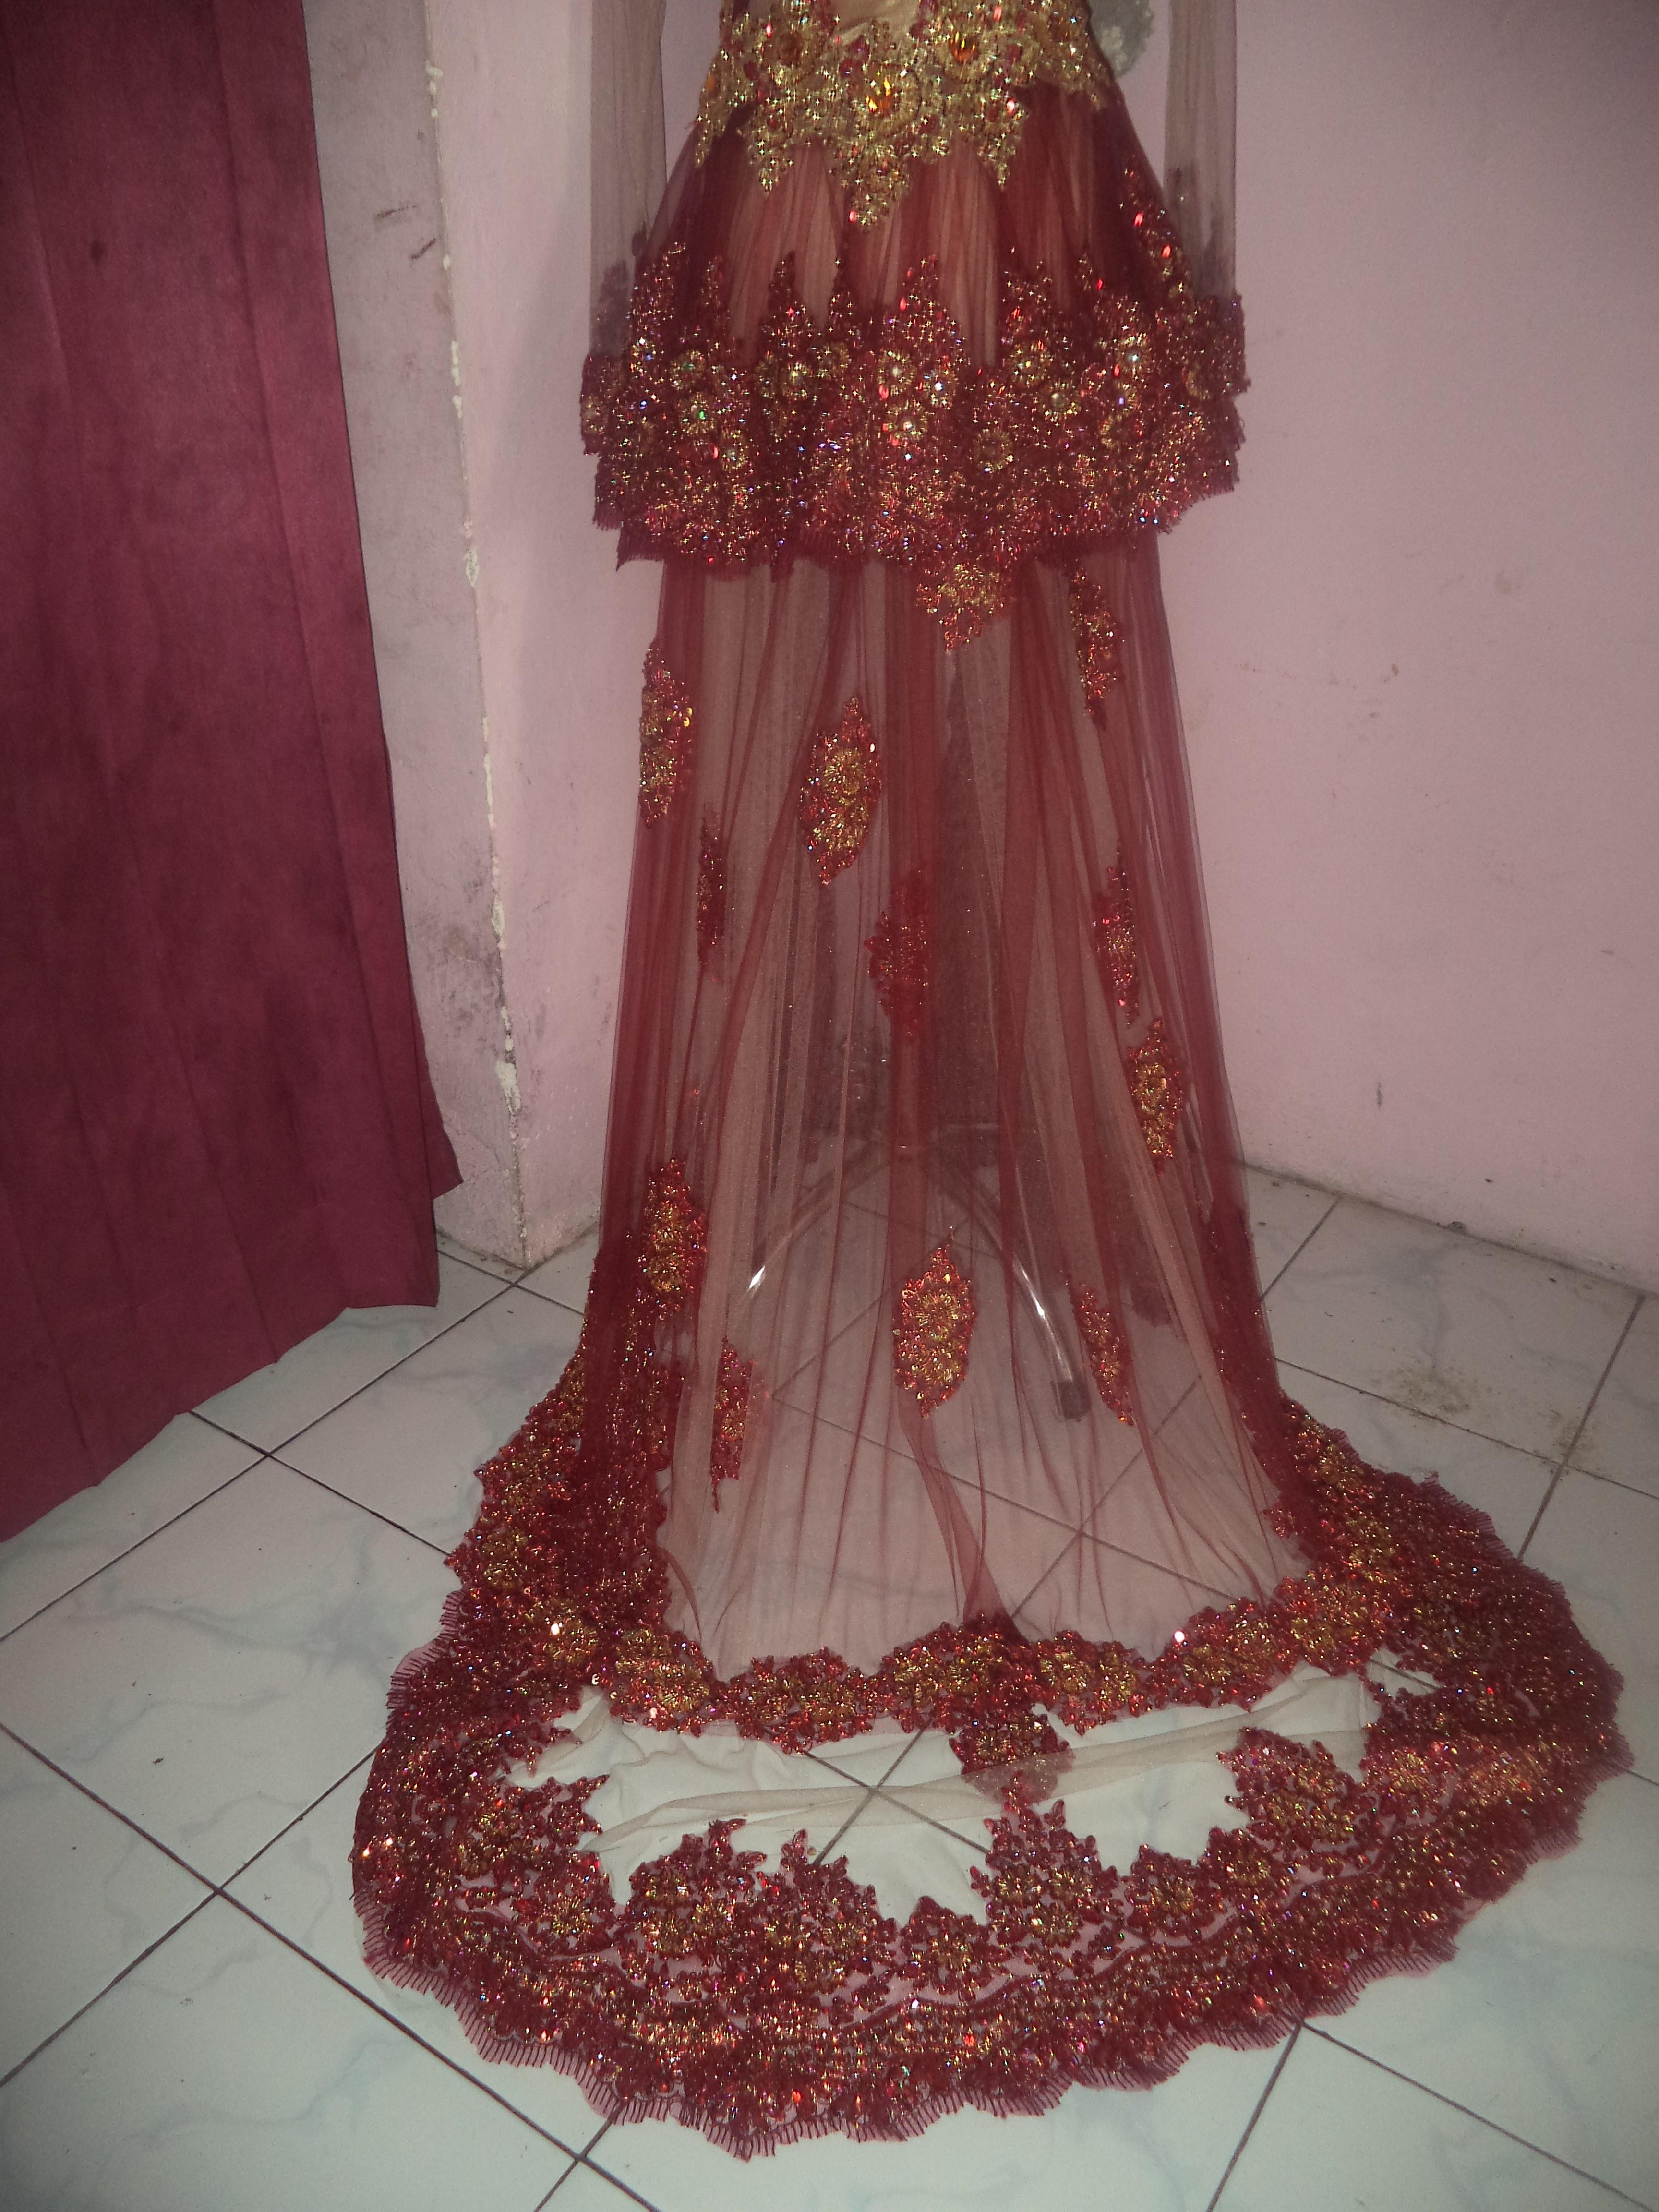 Bentuk Gaun Pengantin Muslimah Warna Merah Marun H9d9 Kebaya Pengantin Muslim Ekor Ganda Warna Merah Maroon